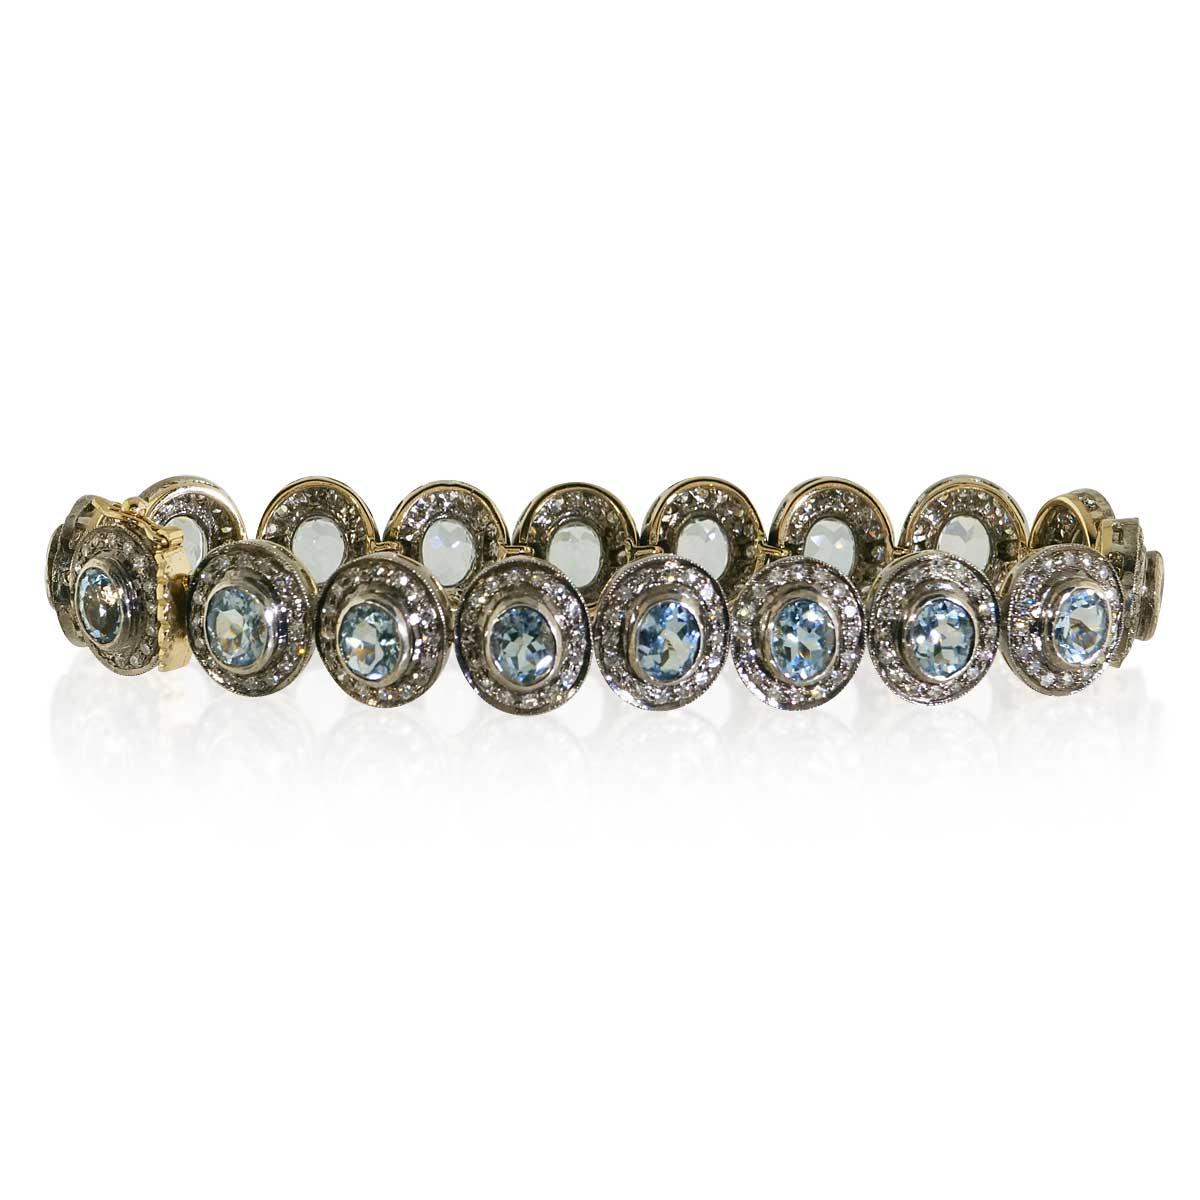 diamant riviere tennisarmband wei gold armband 18 kt mit. Black Bedroom Furniture Sets. Home Design Ideas